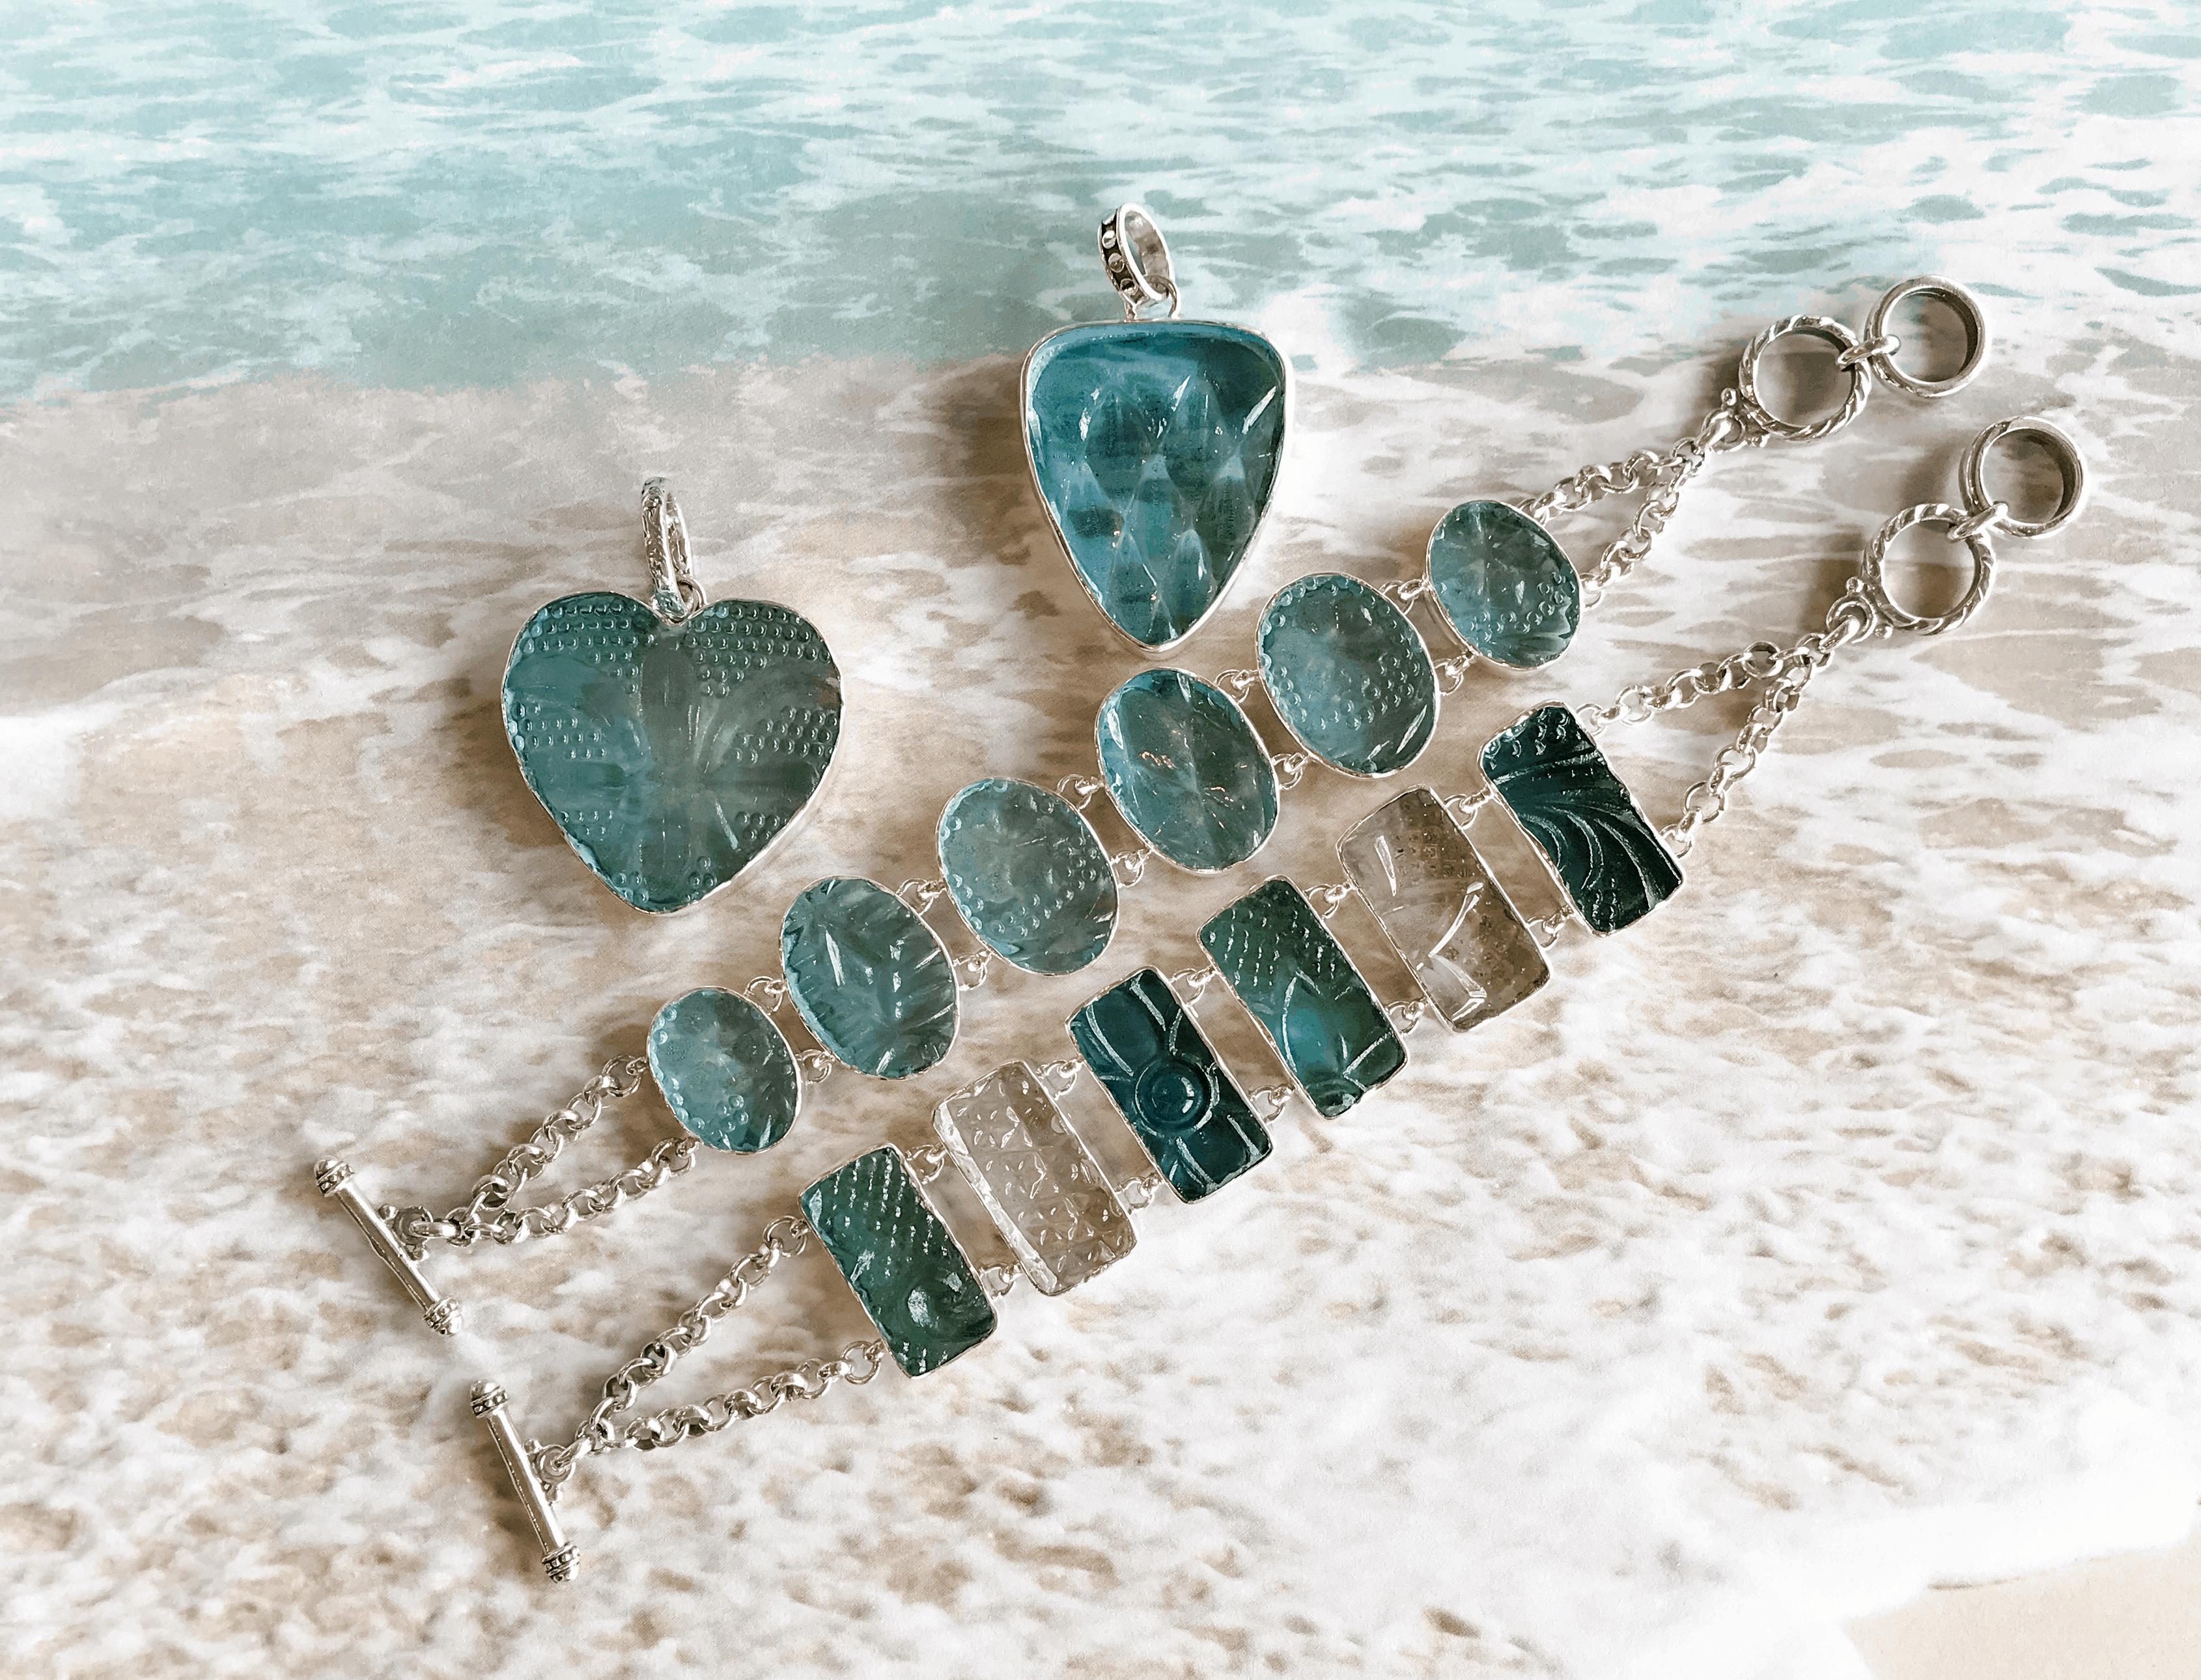 On the Beach Jewelry